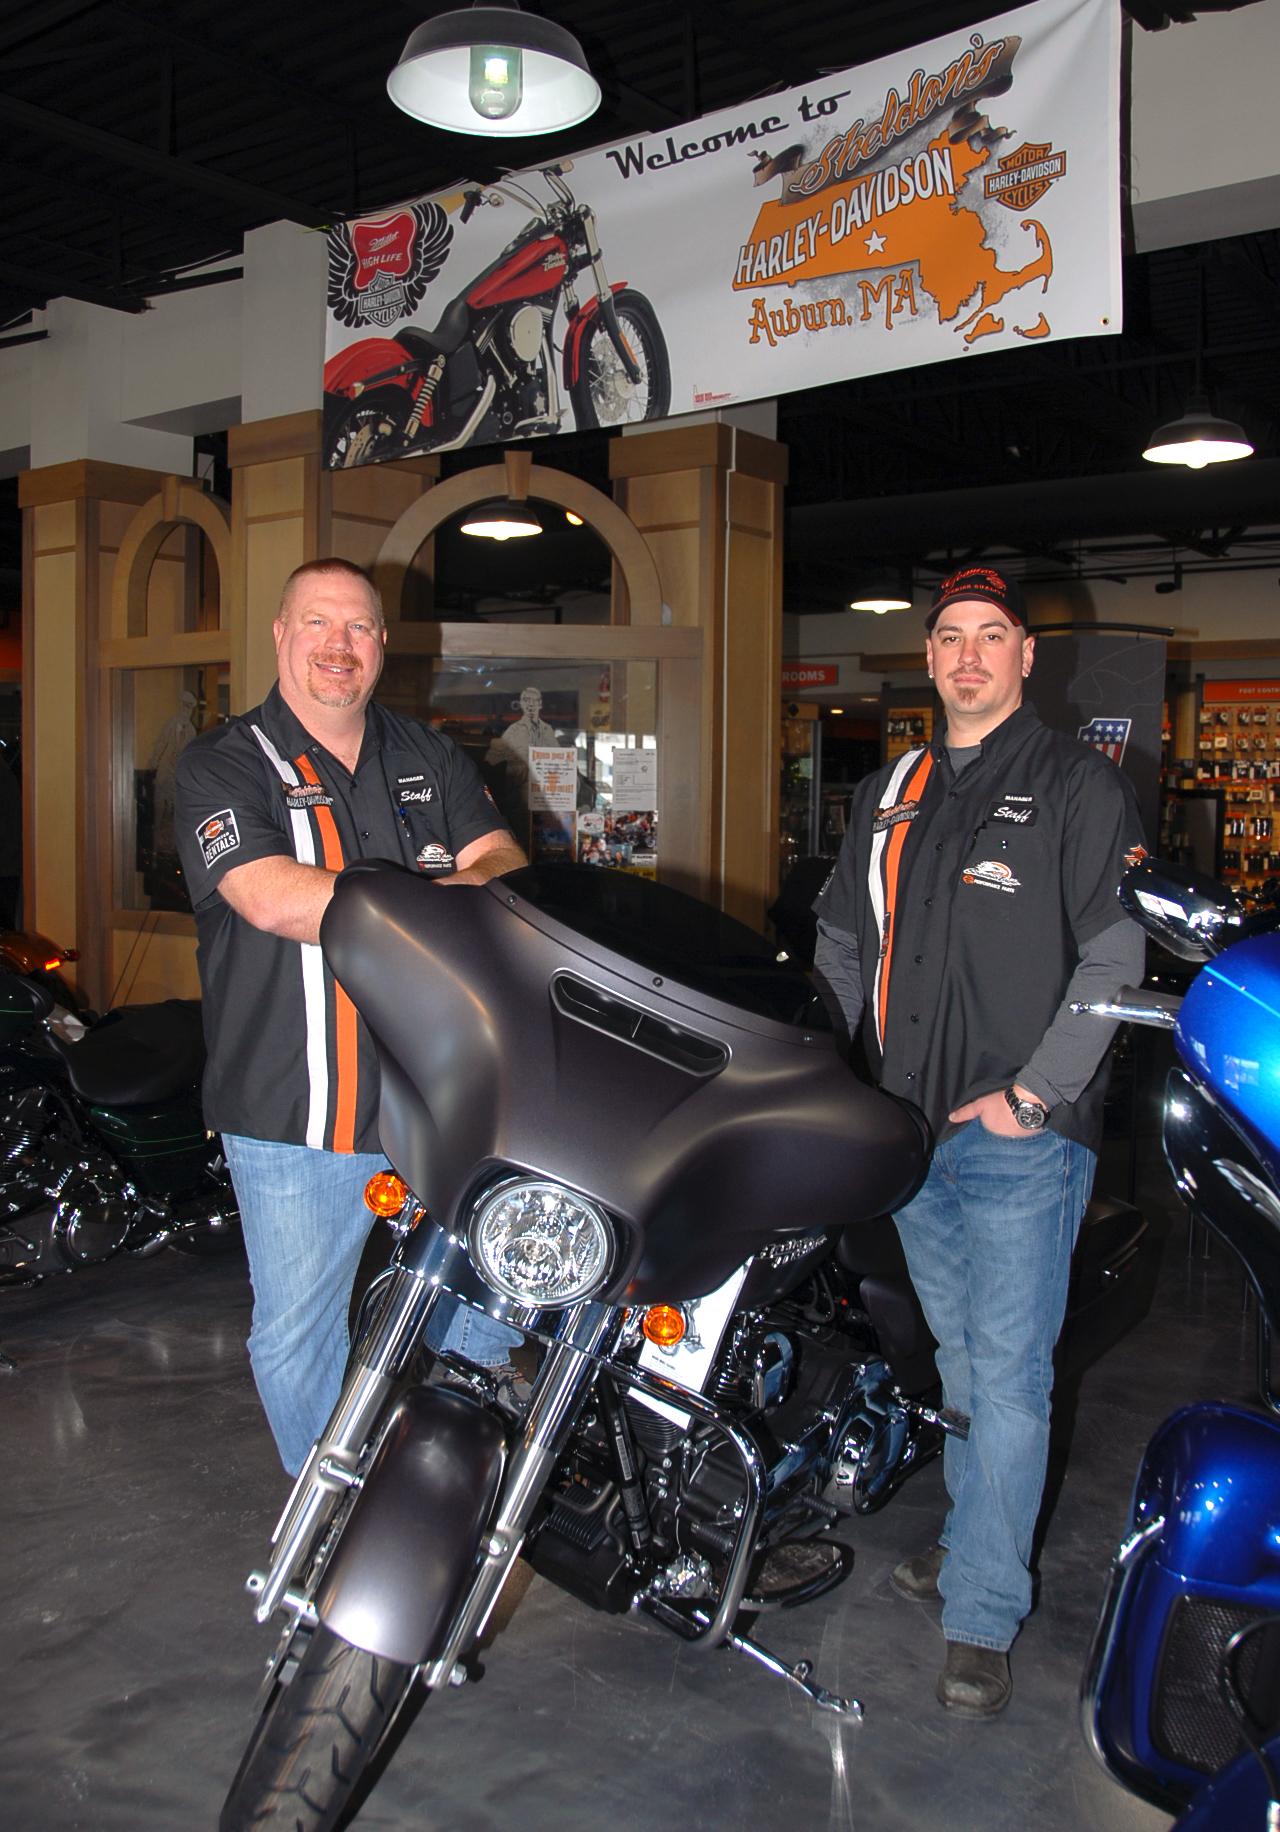 Sheldon S Harley Davidson Wins Harley Davidson 2014 Bronze